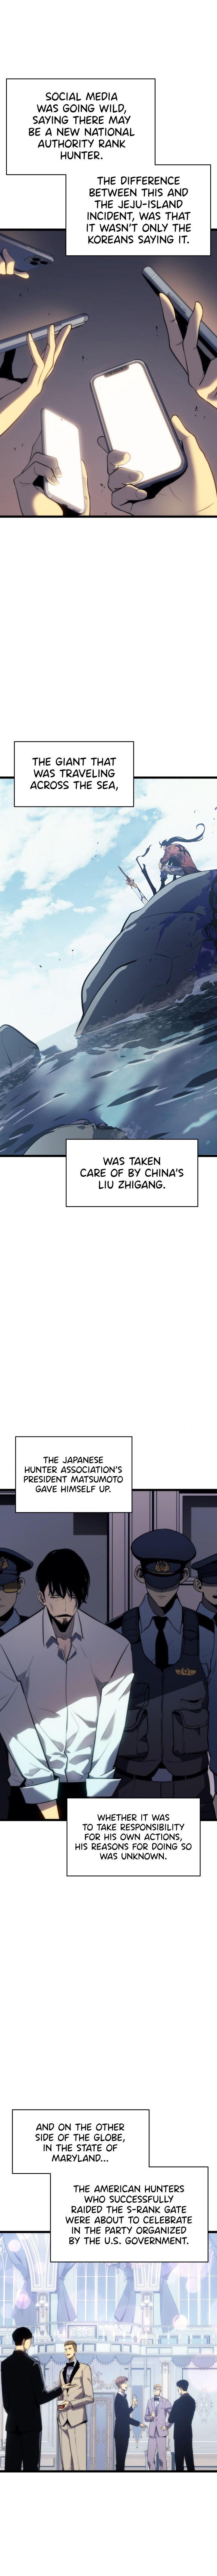 Solo Leveling Vol.2 Chapter 139 page 6 - Mangakakalots.com